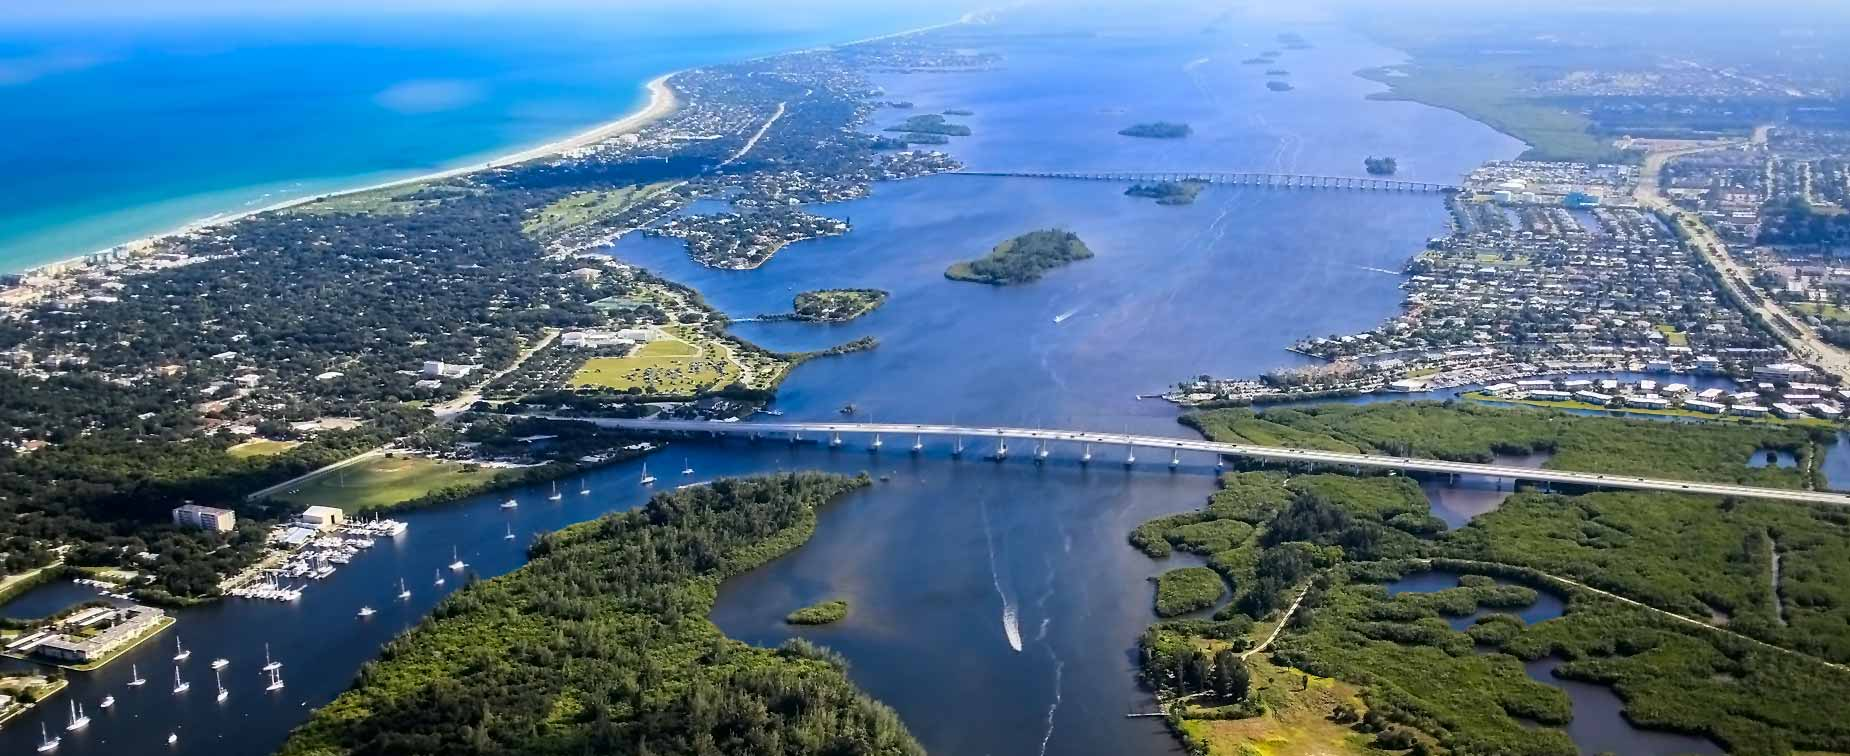 Aerial photo of Vero Beach, Florida